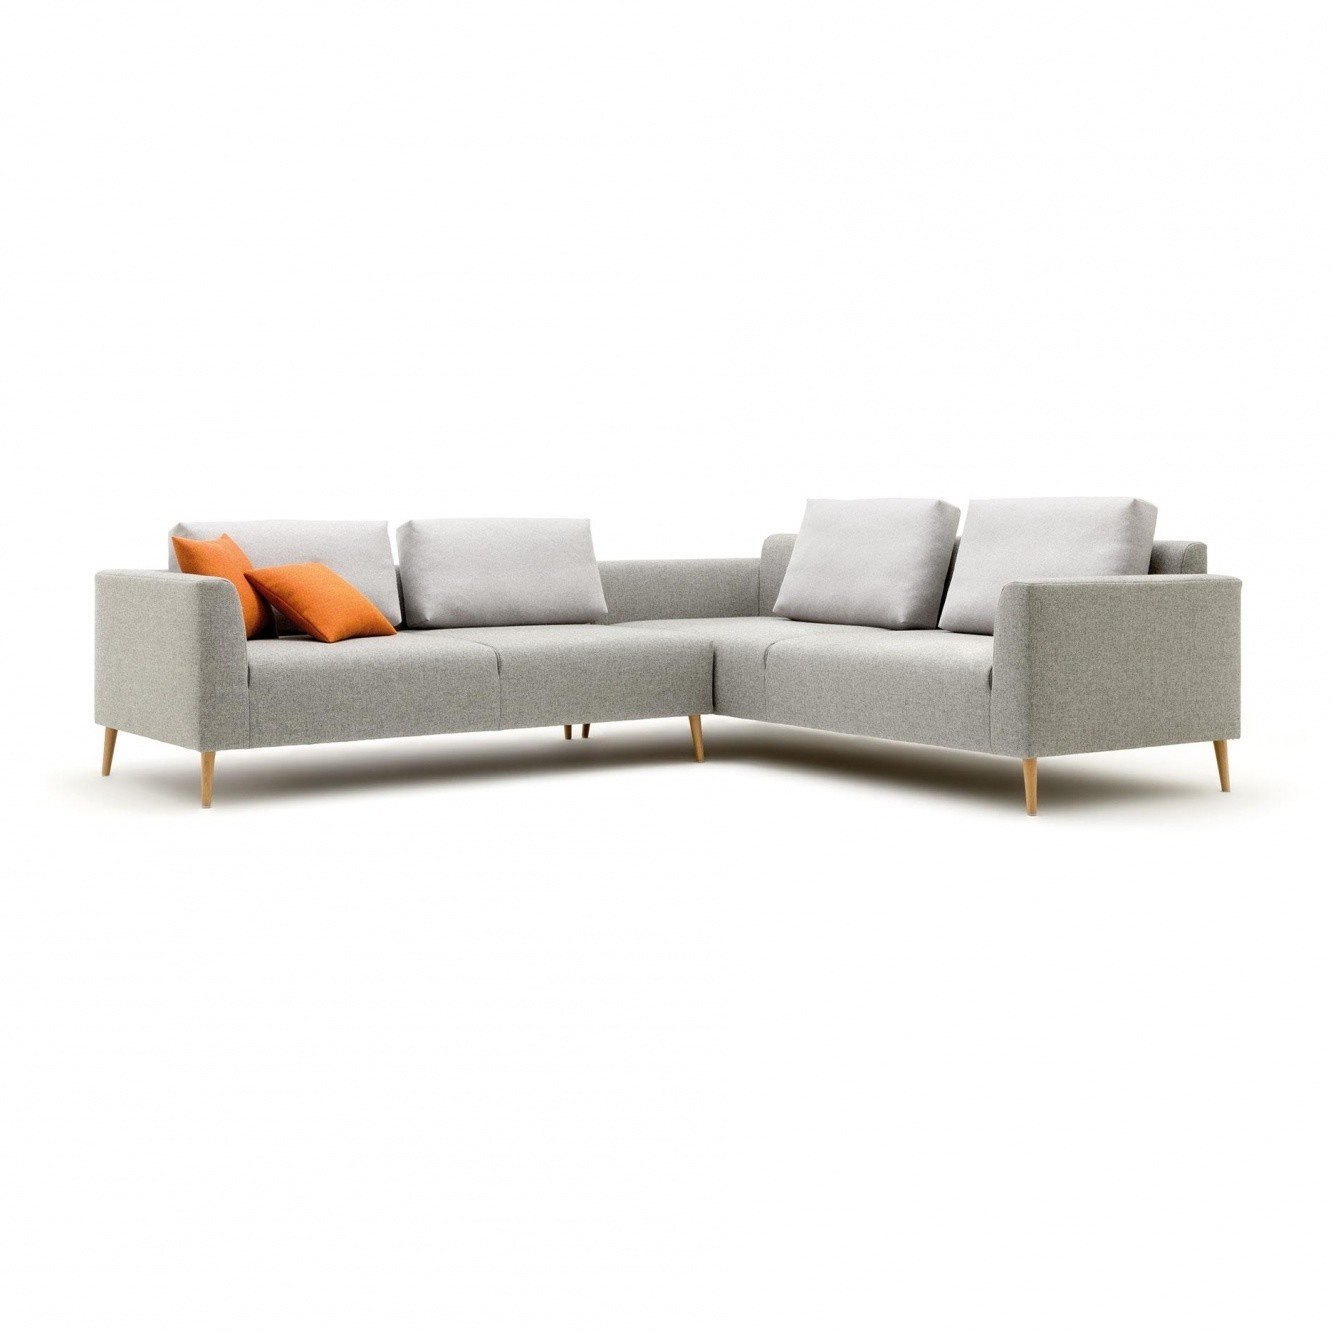 Freistil Rolf Benz Freistil 162 Sofa Ambientedirect